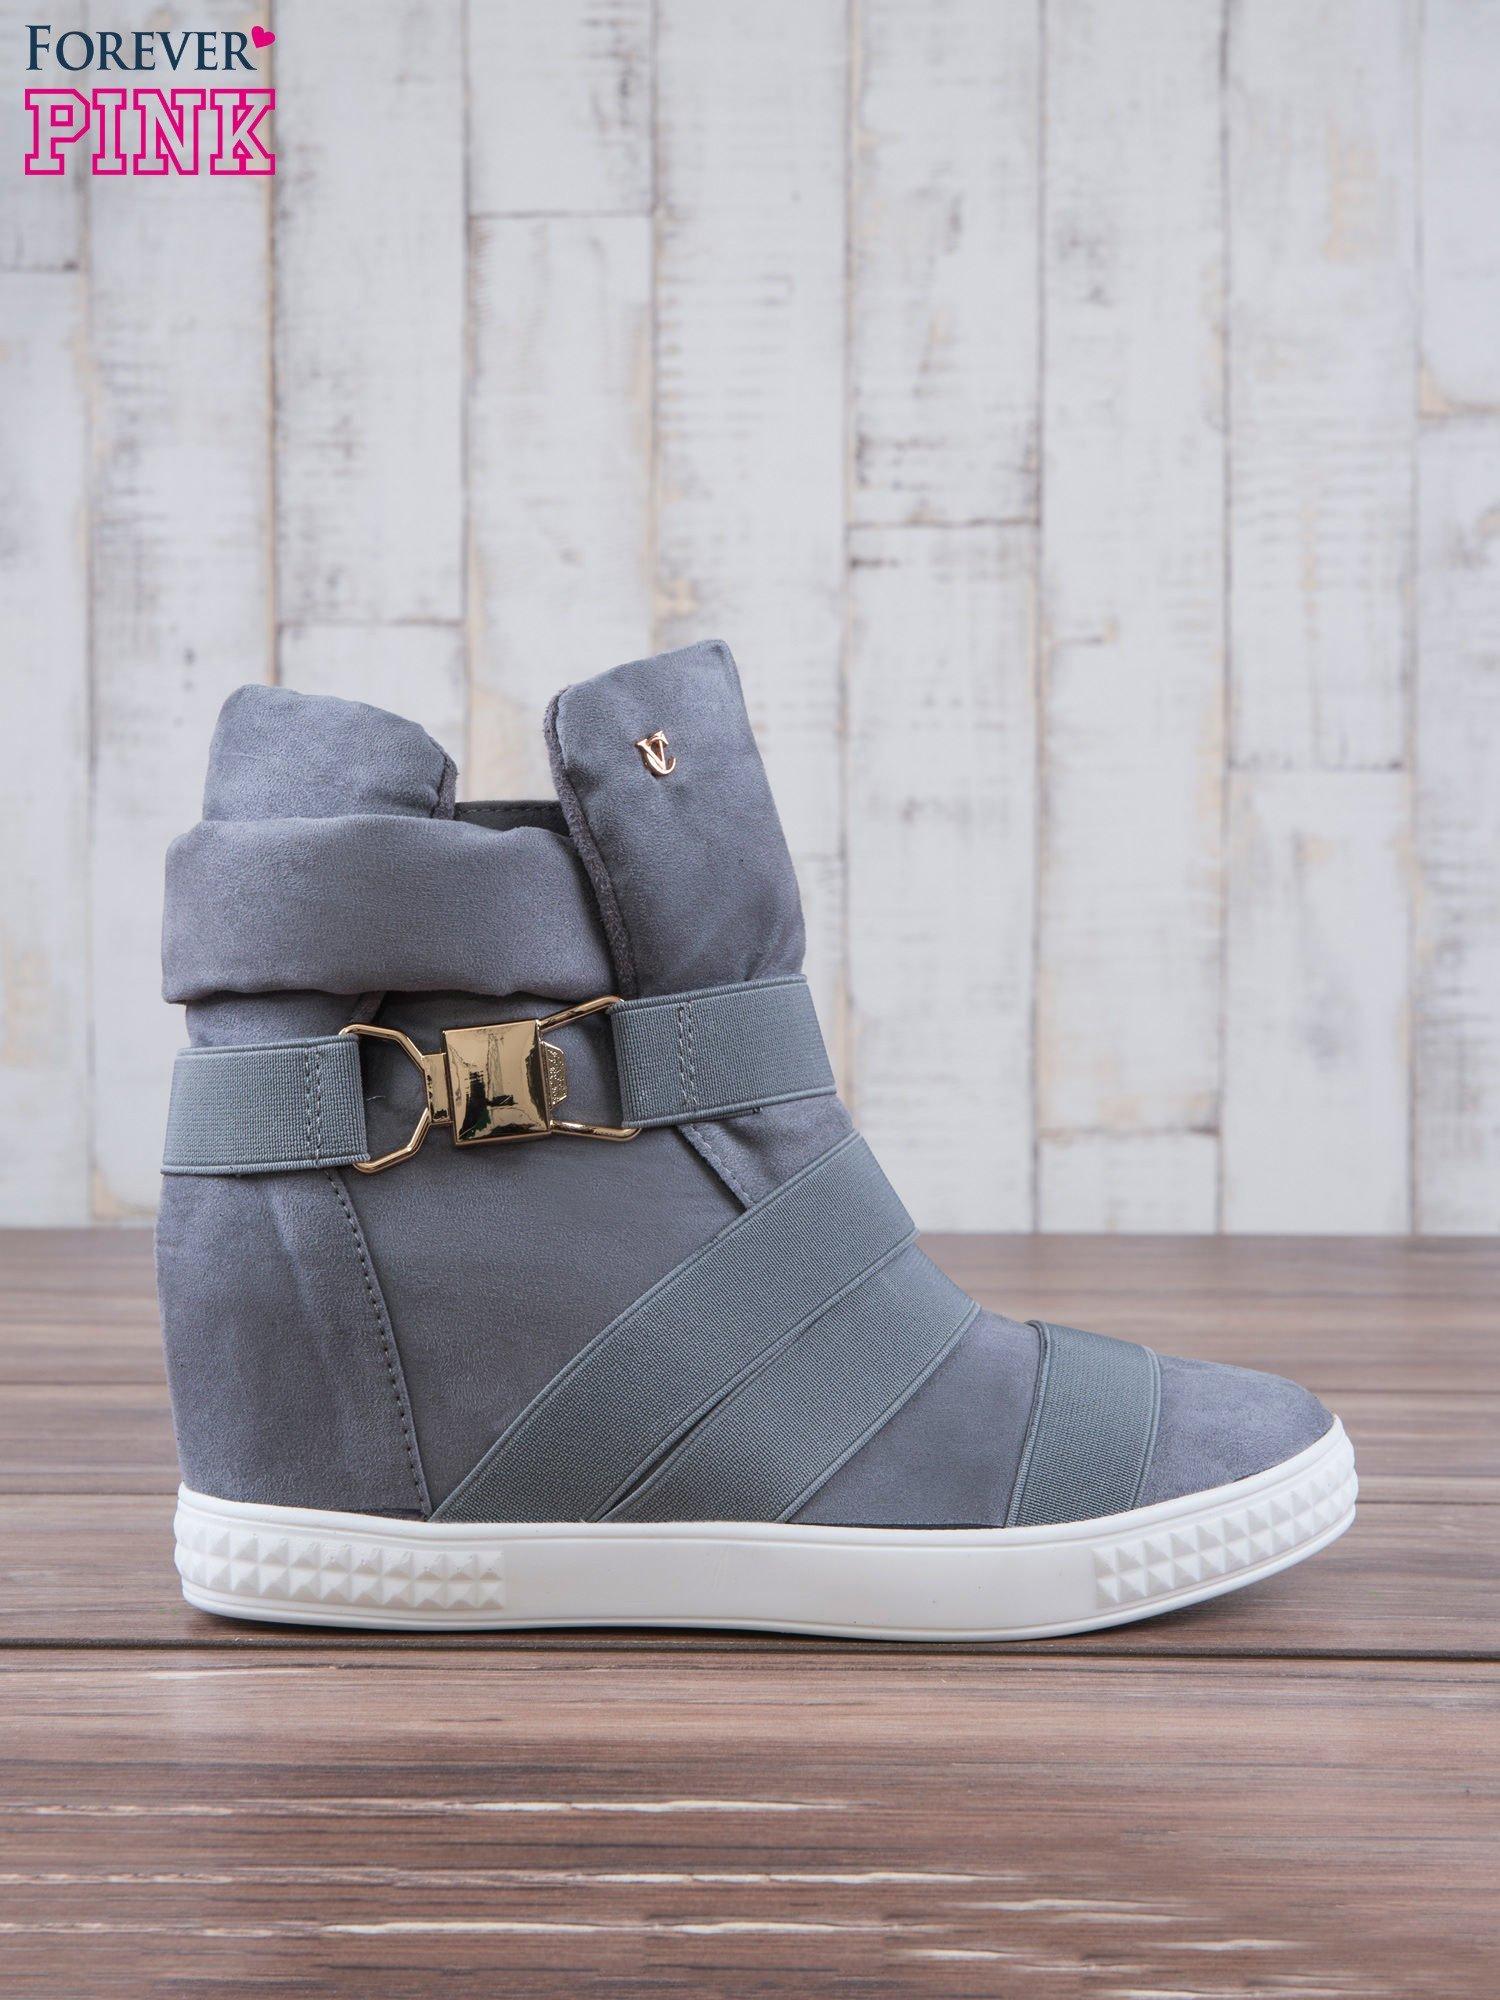 Szare zamszowe sneakersy bandage z klamerką Lucky                                  zdj.                                  2